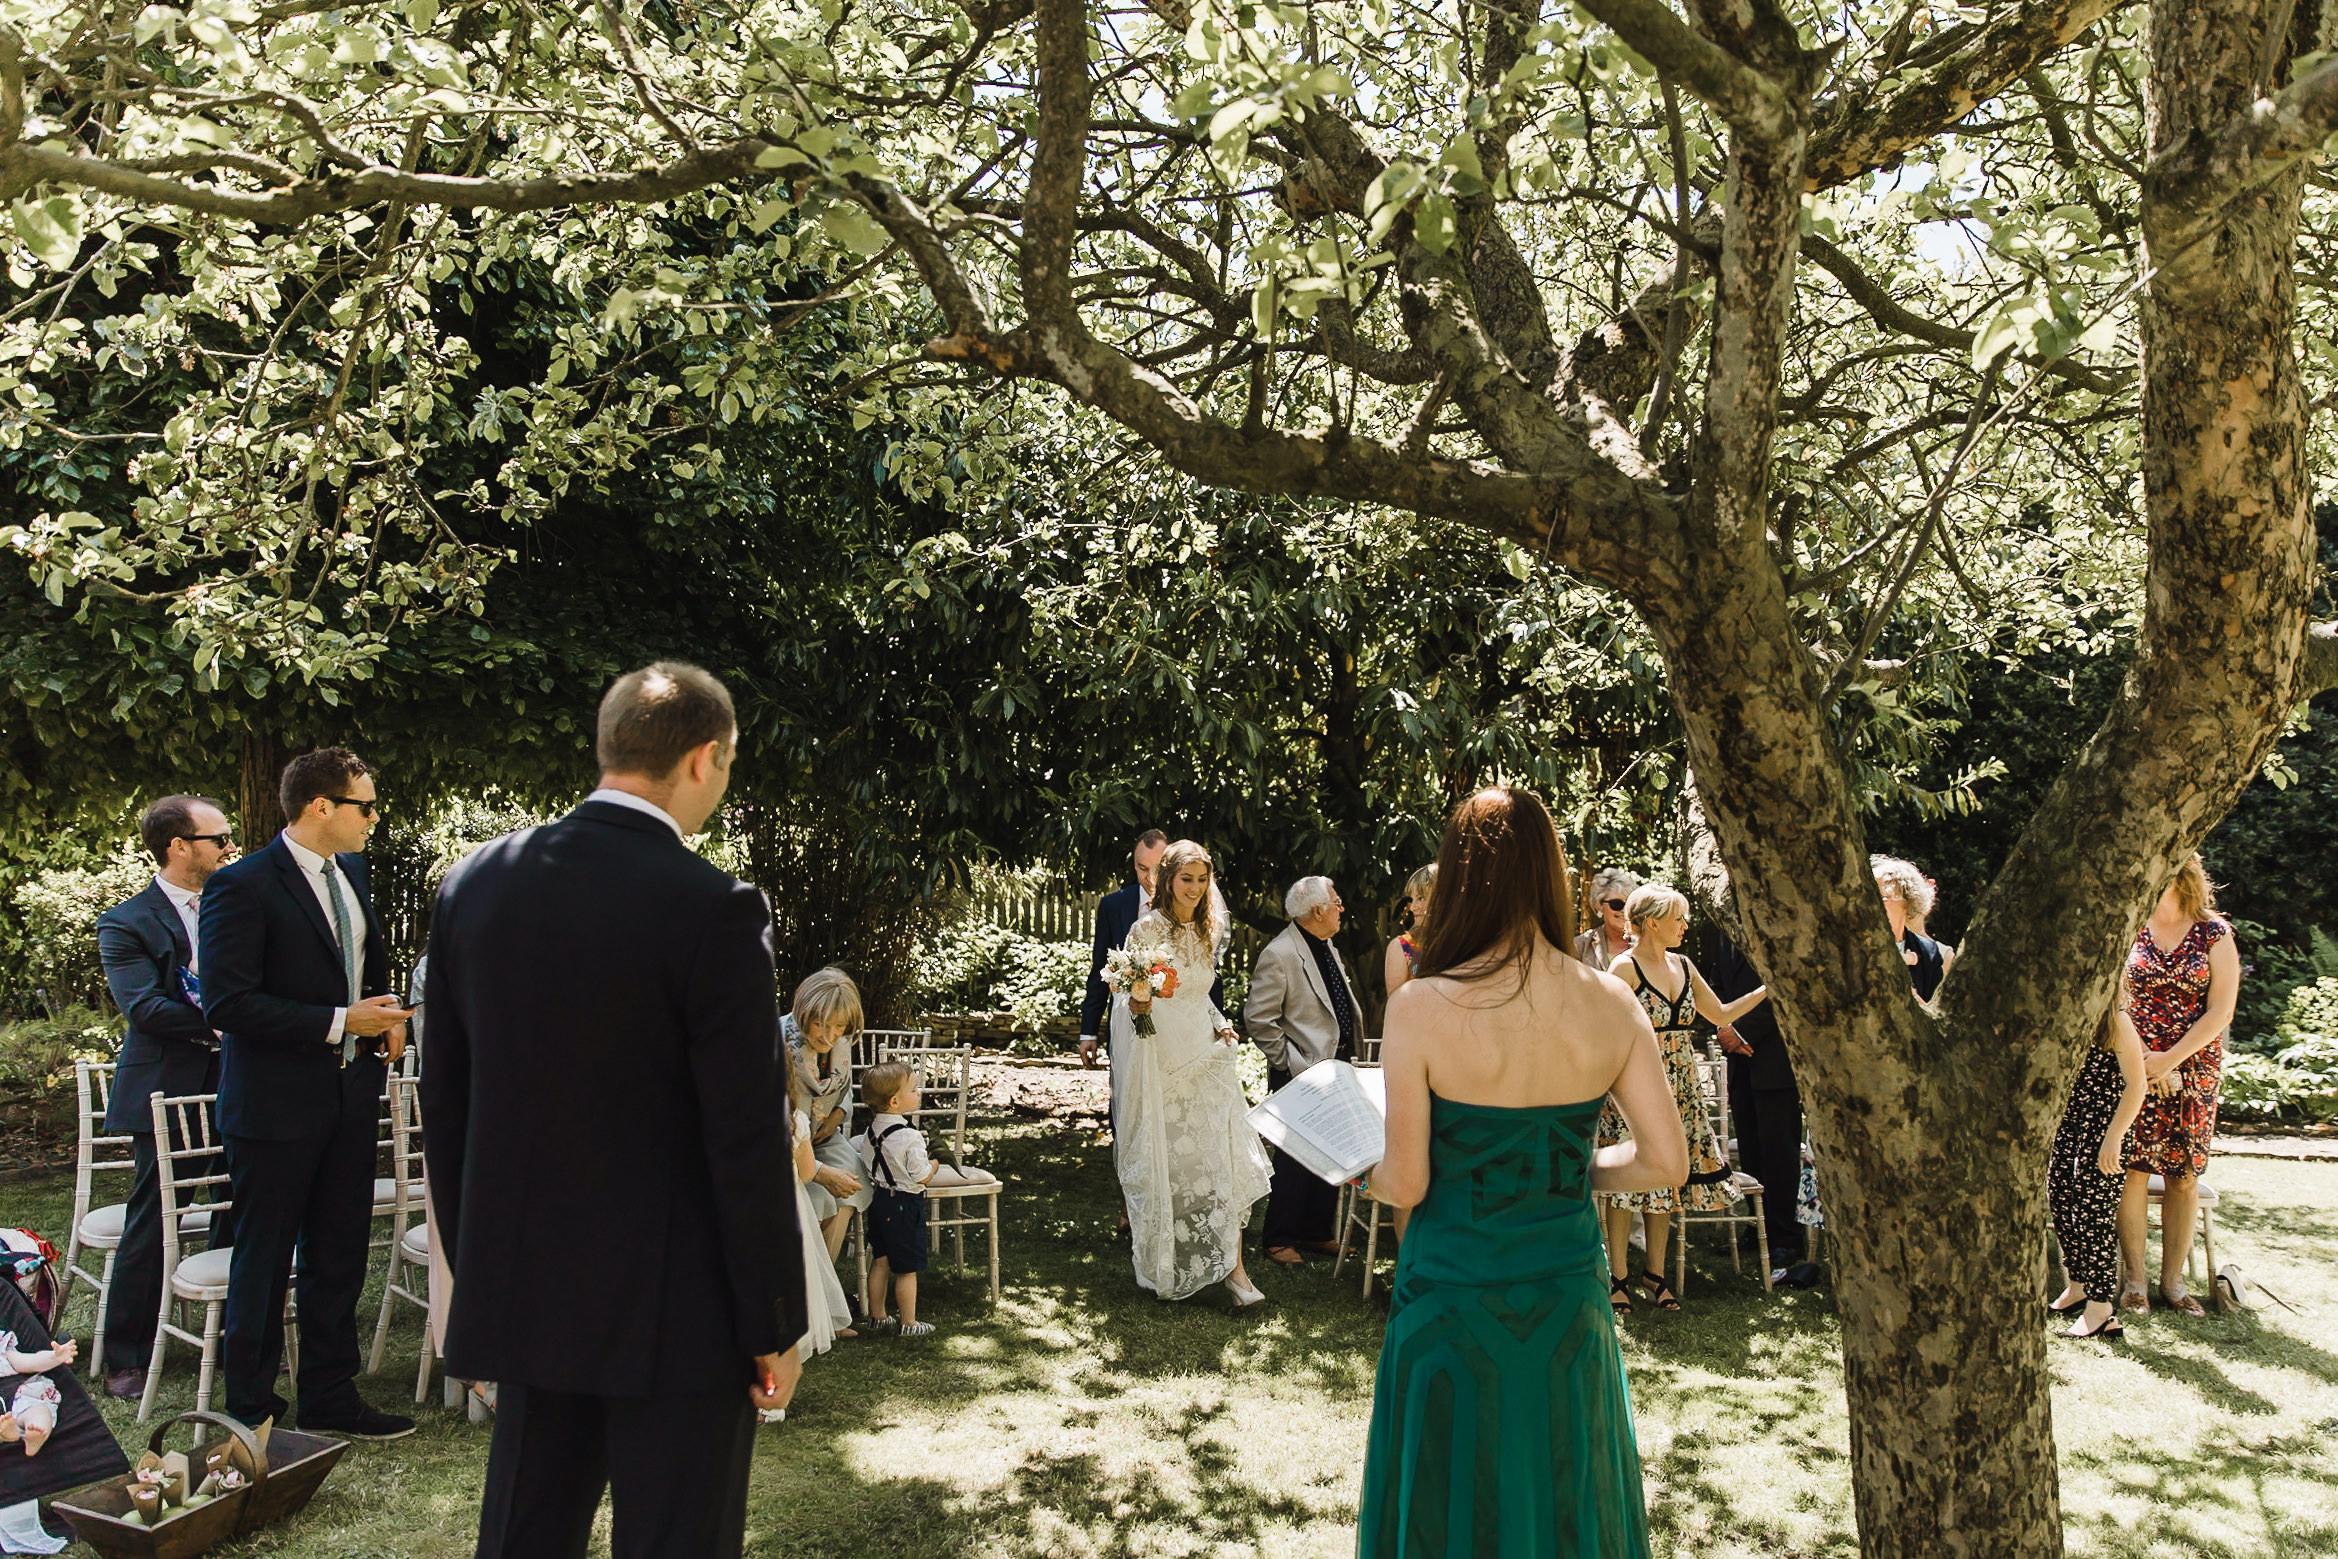 Roundhay-Leeds-Backyard-Wedding-Becs-Chris-085.jpg